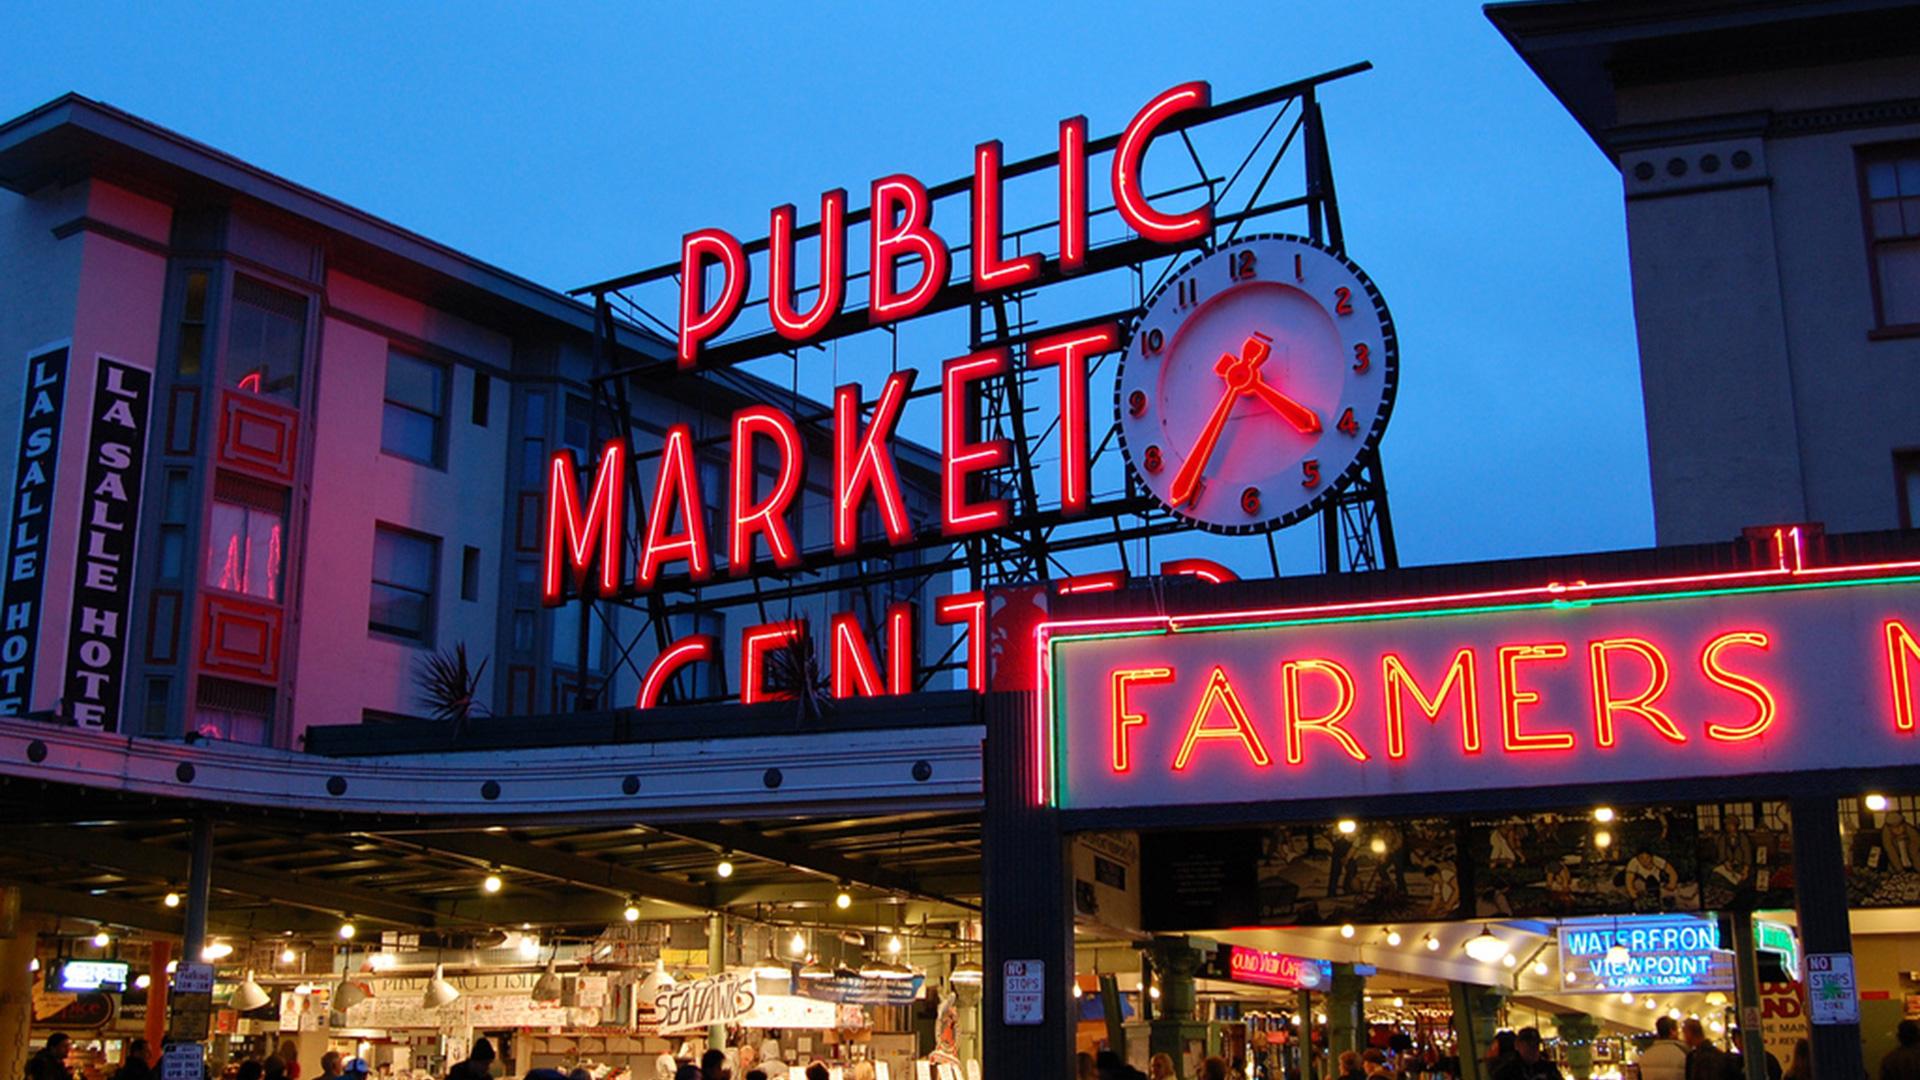 Entrance Design Pike Place Market Swenson Say Fag 233 T